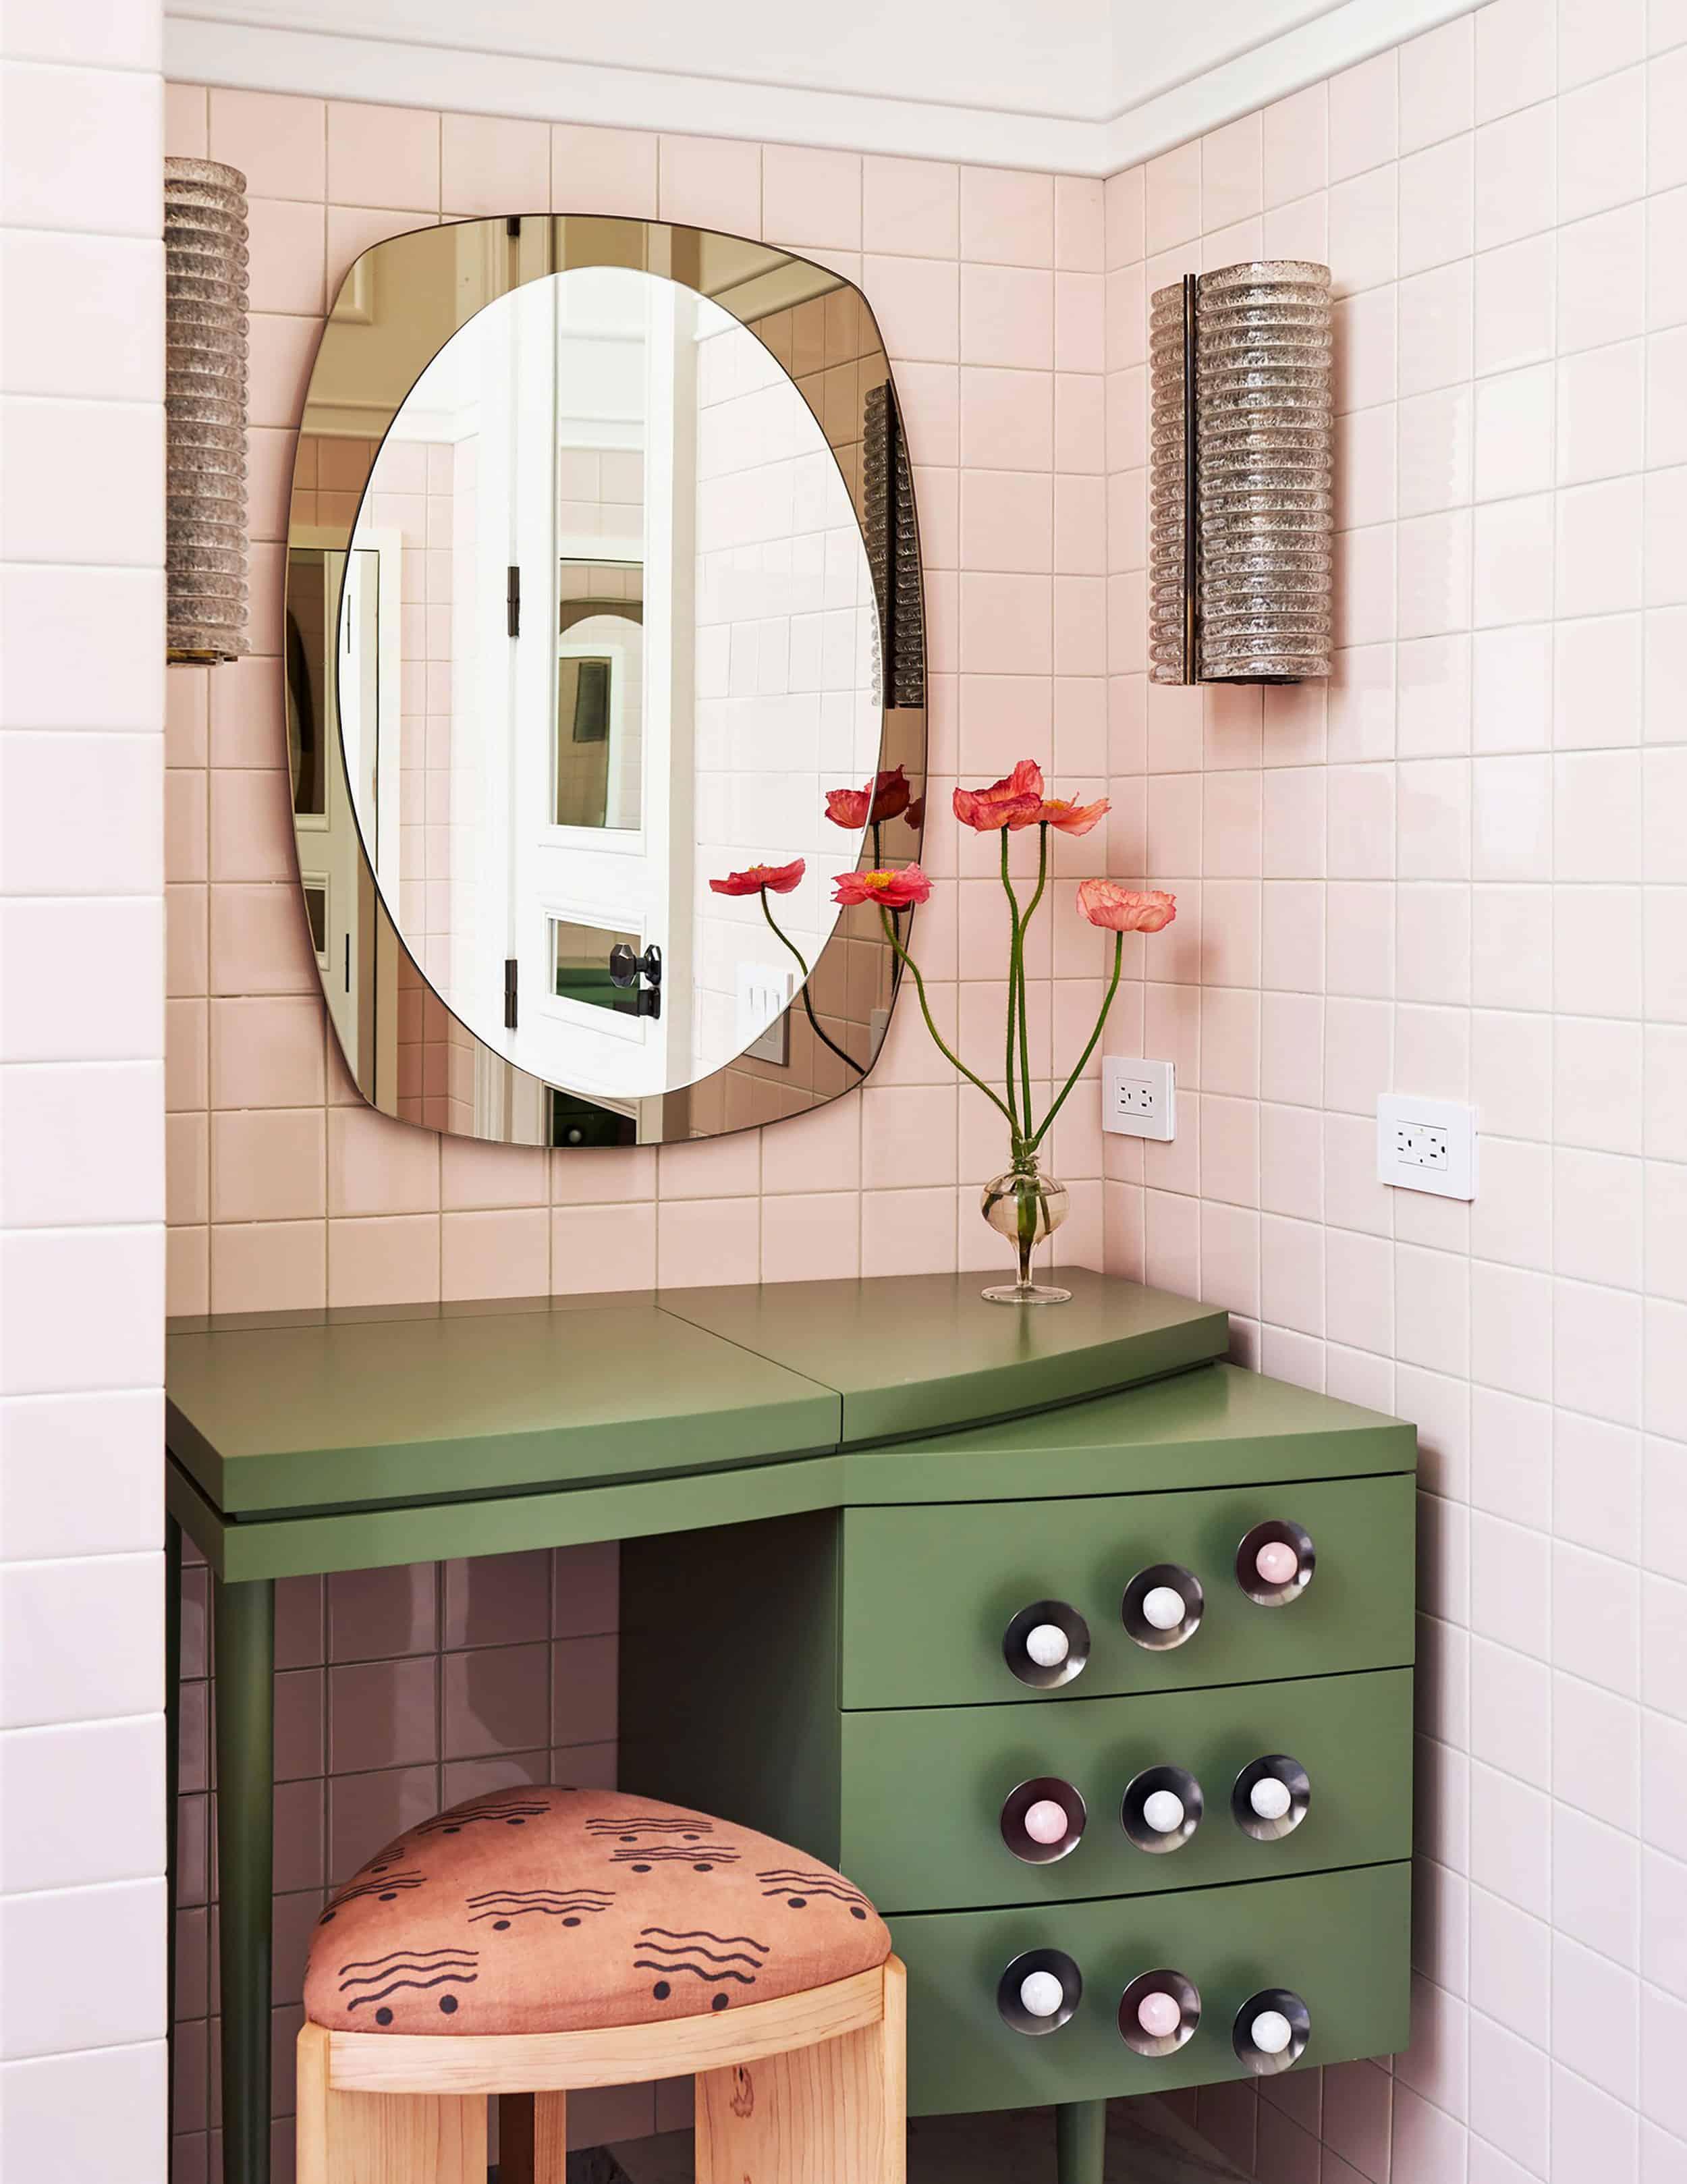 Image Via Architectural Digest Design By Meg Sharpe 2